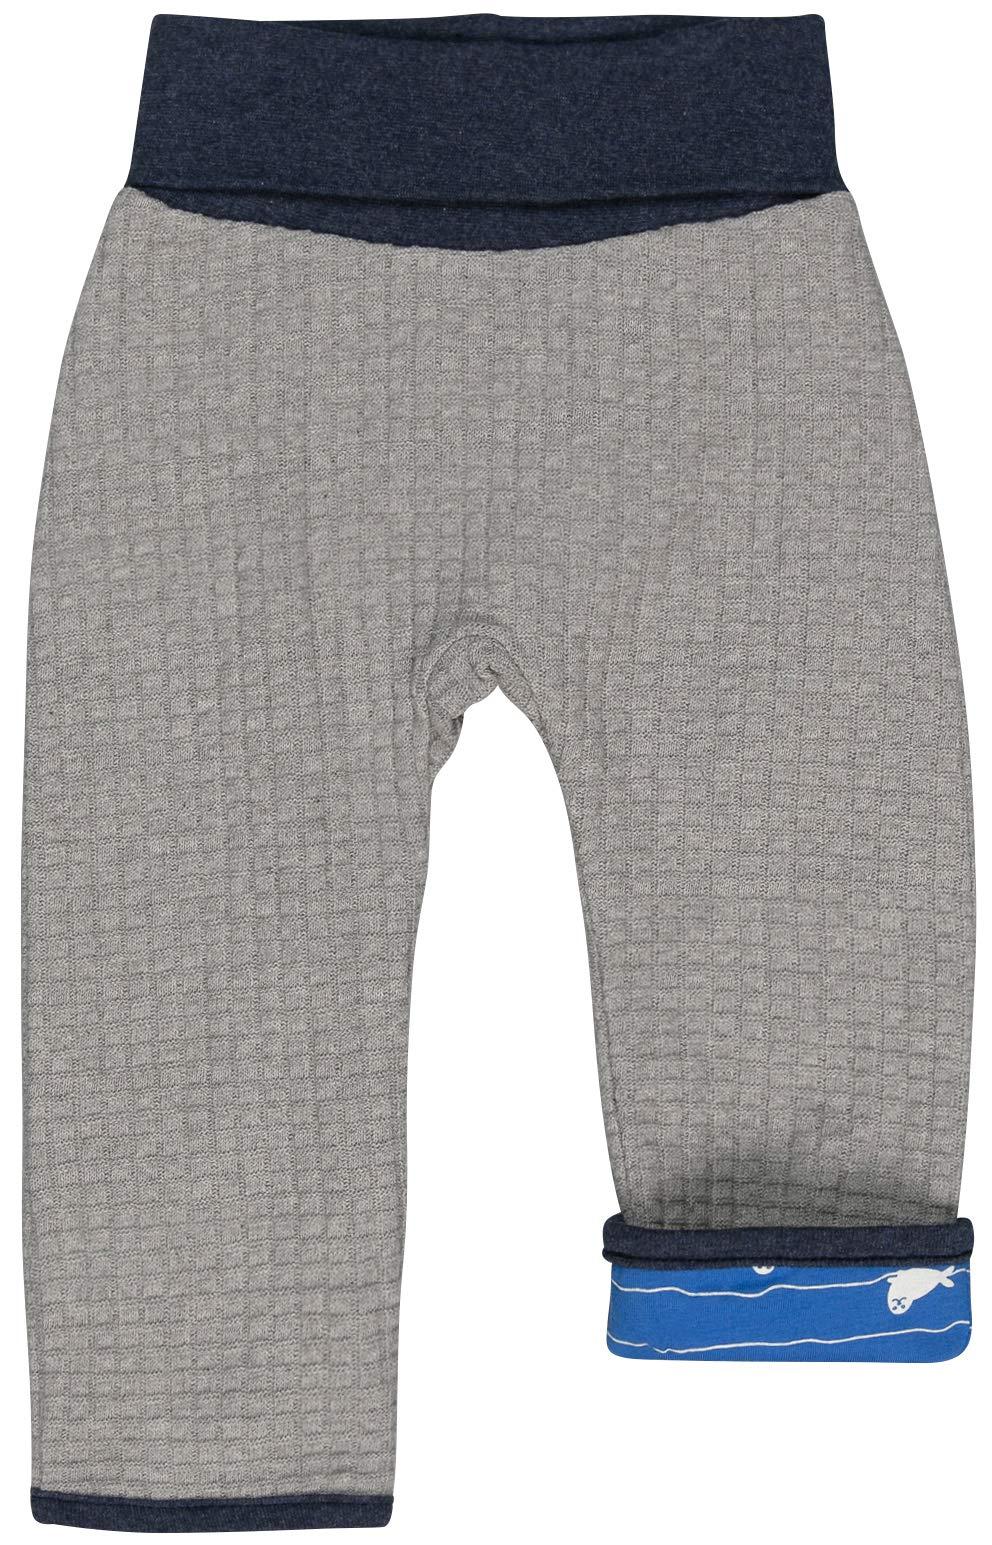 loud + proud Wendehose Strick Aus Bio Baumwolle, Gots Zertifiziert Pantalones para Bebés 2